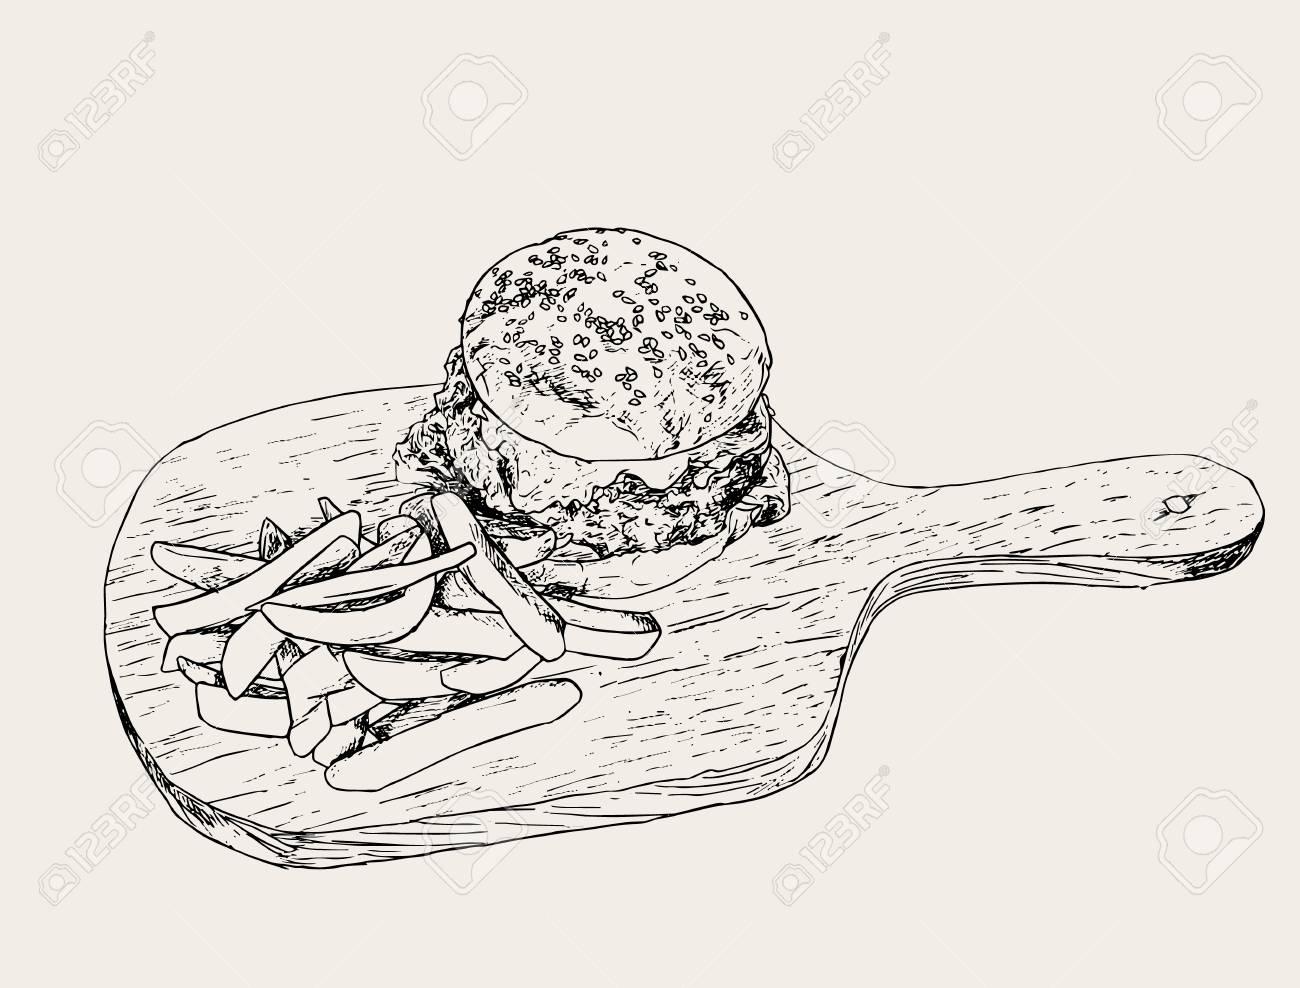 hamburger and fries a set of fast food drawings drawn by hand